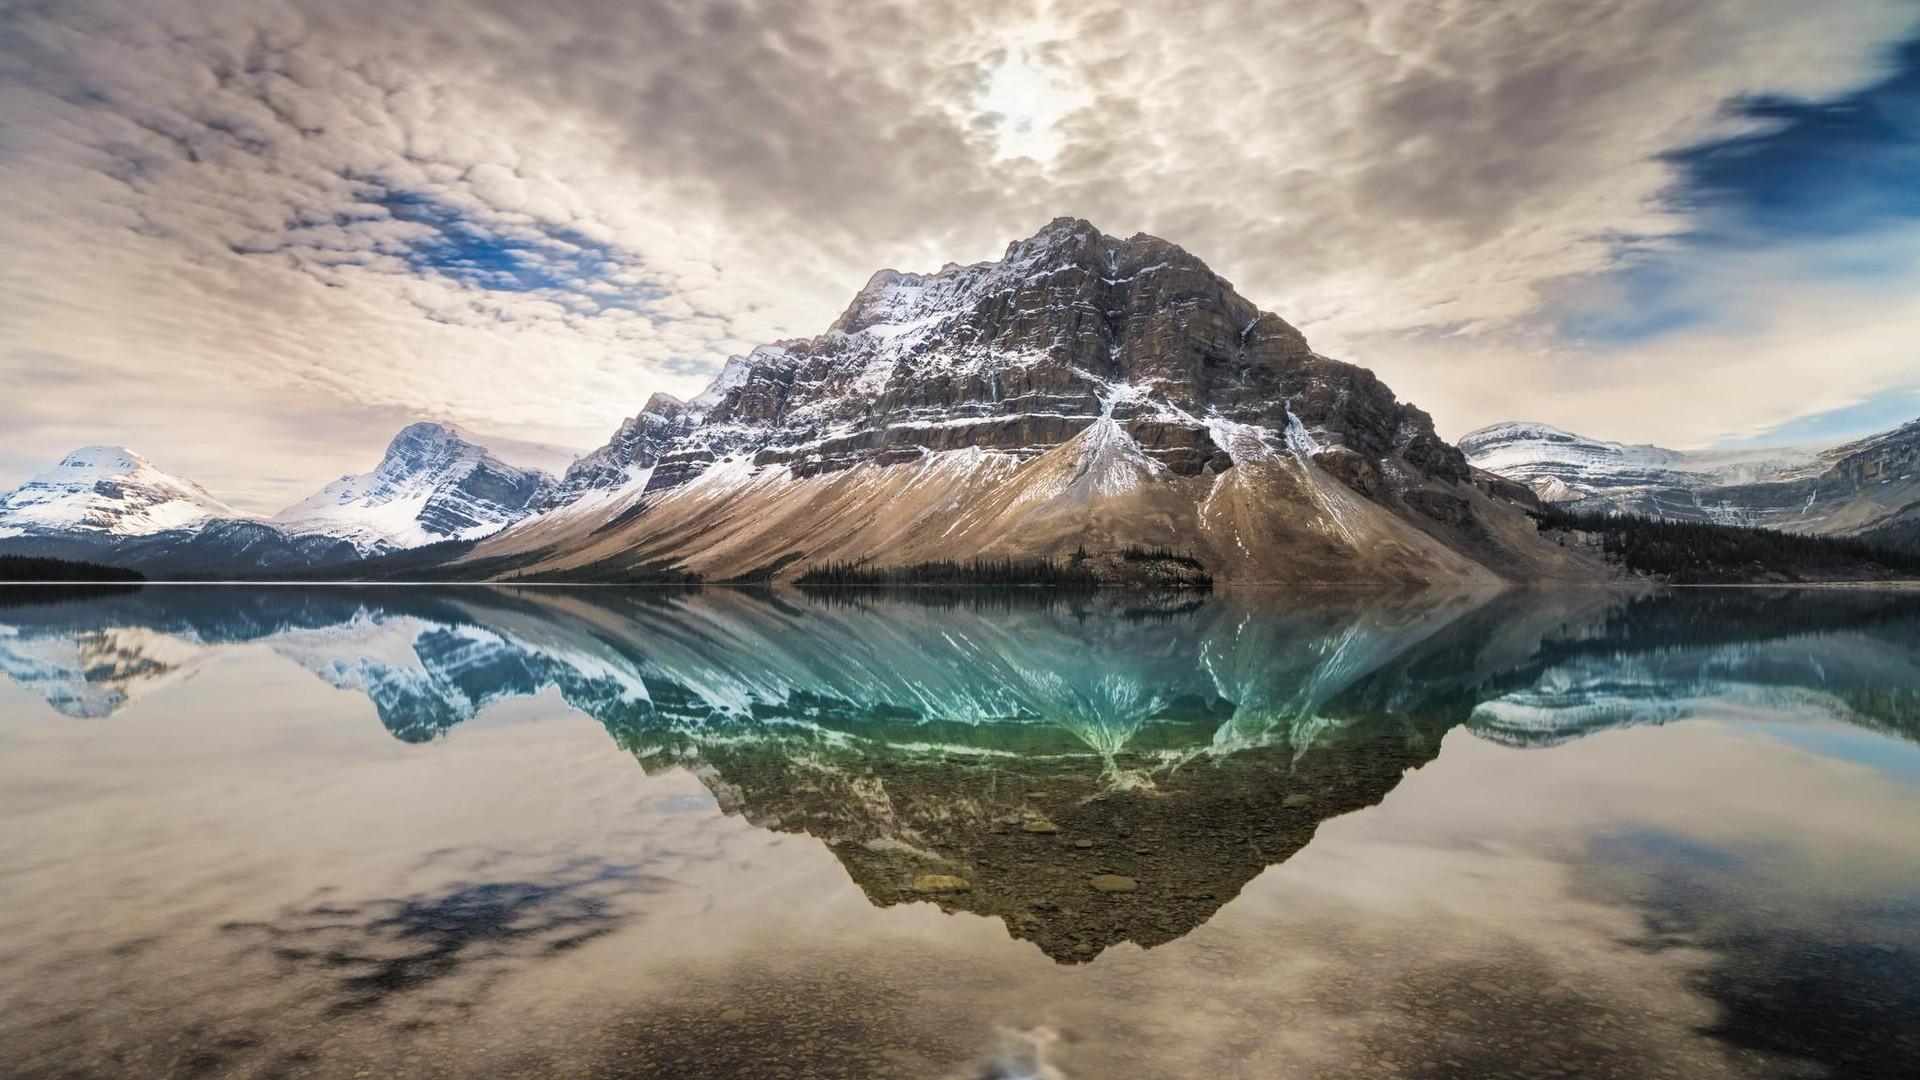 General 1920x1080 landscape nature Canada mountains reflection Bow Lake nordic landscapes Banff National Park